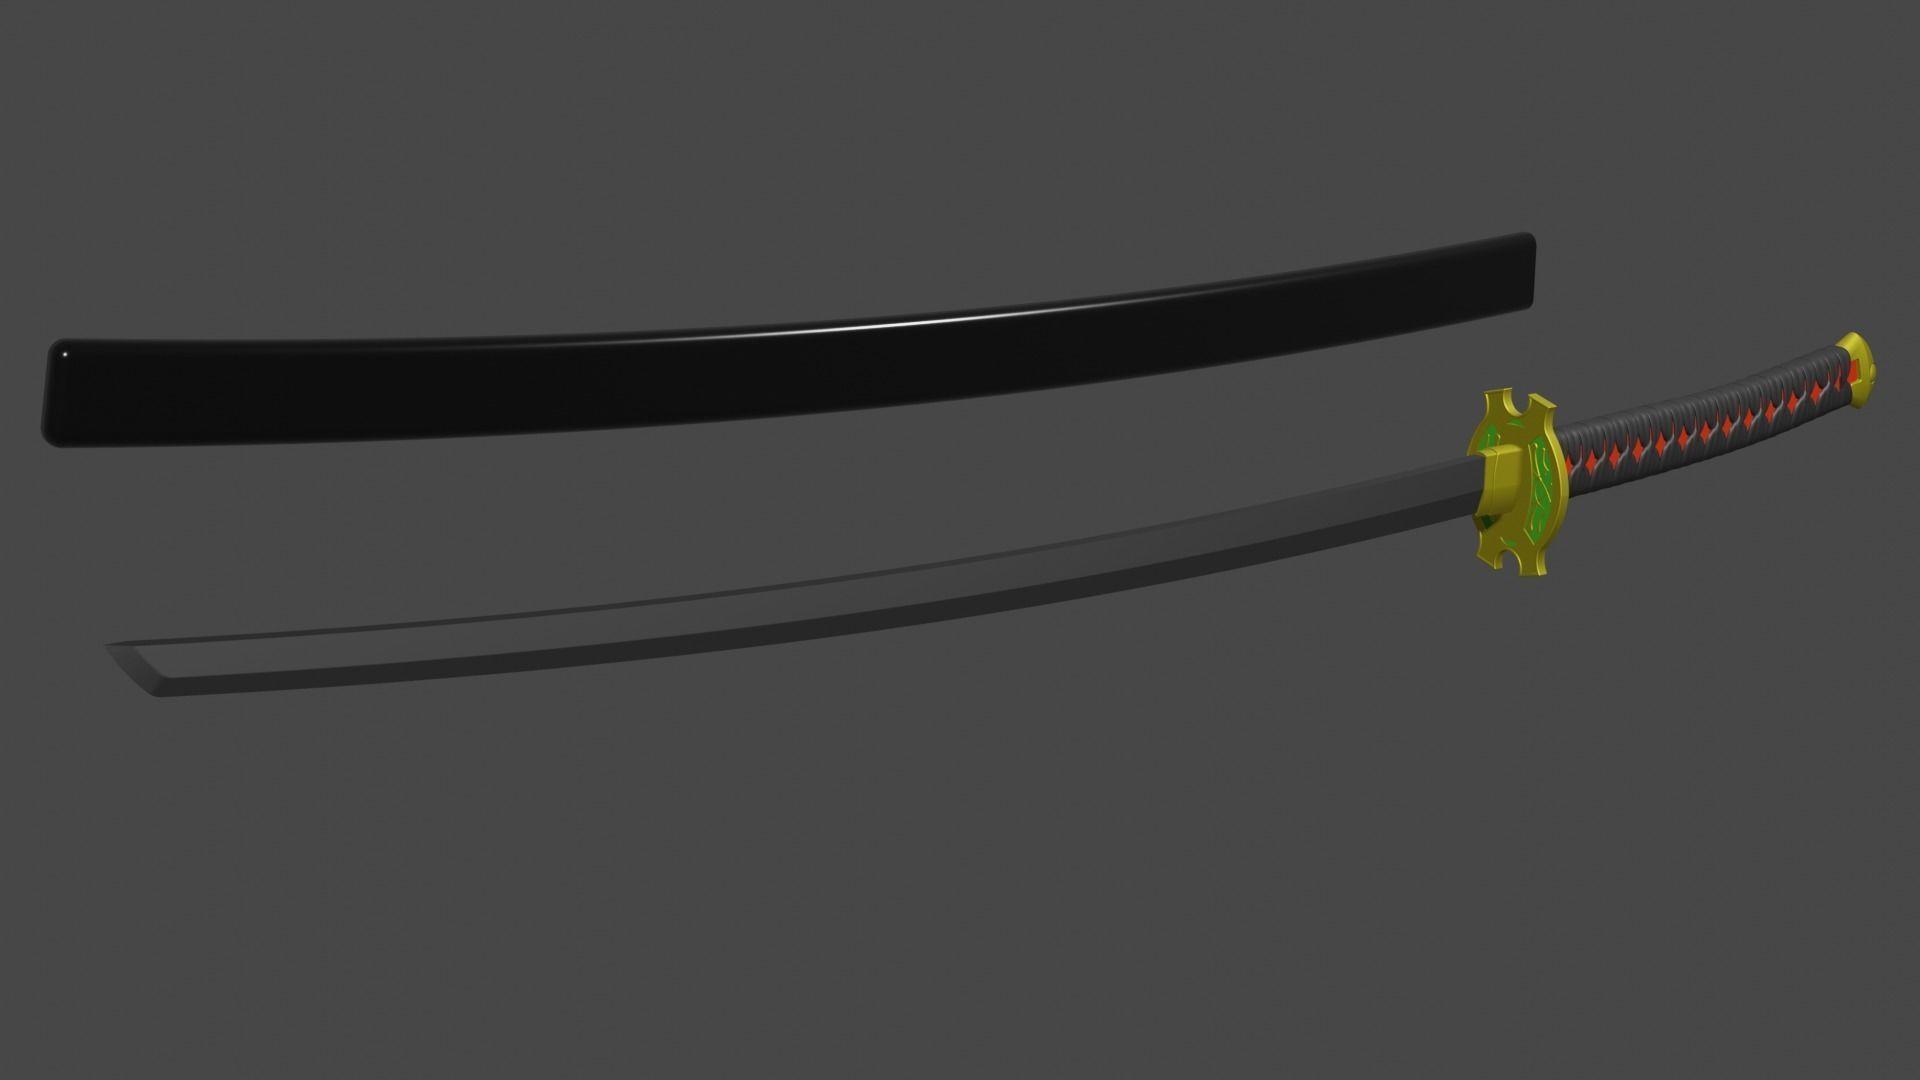 erza scarlet samurai sword katana cosplay